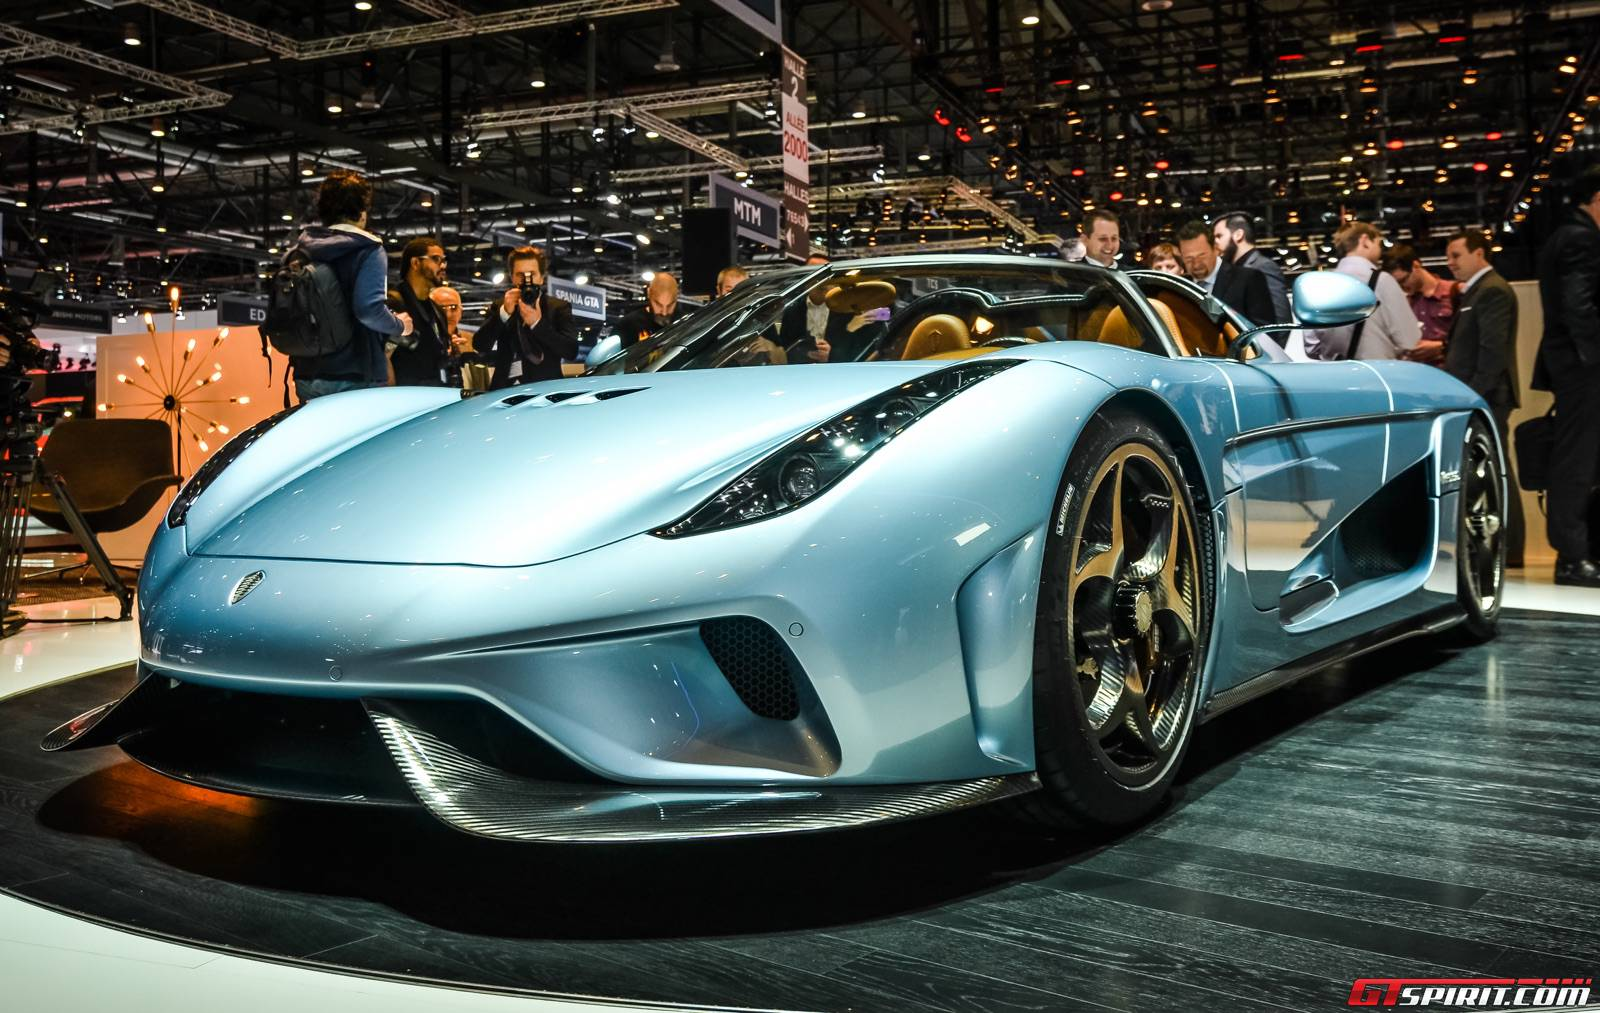 Lamborghini Calgary Named Second North American Koenigsegg Dealer